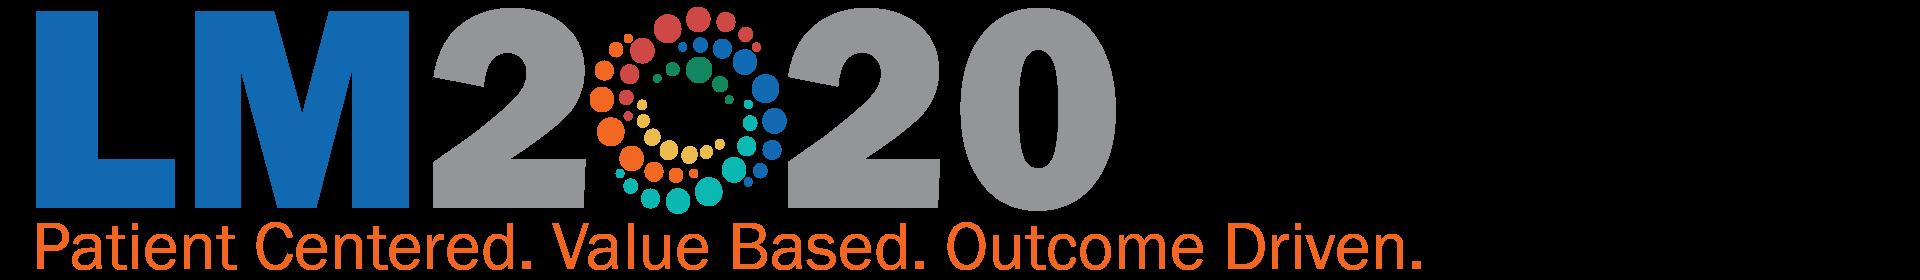 Lifestyle Medicine 2020 Event Banner